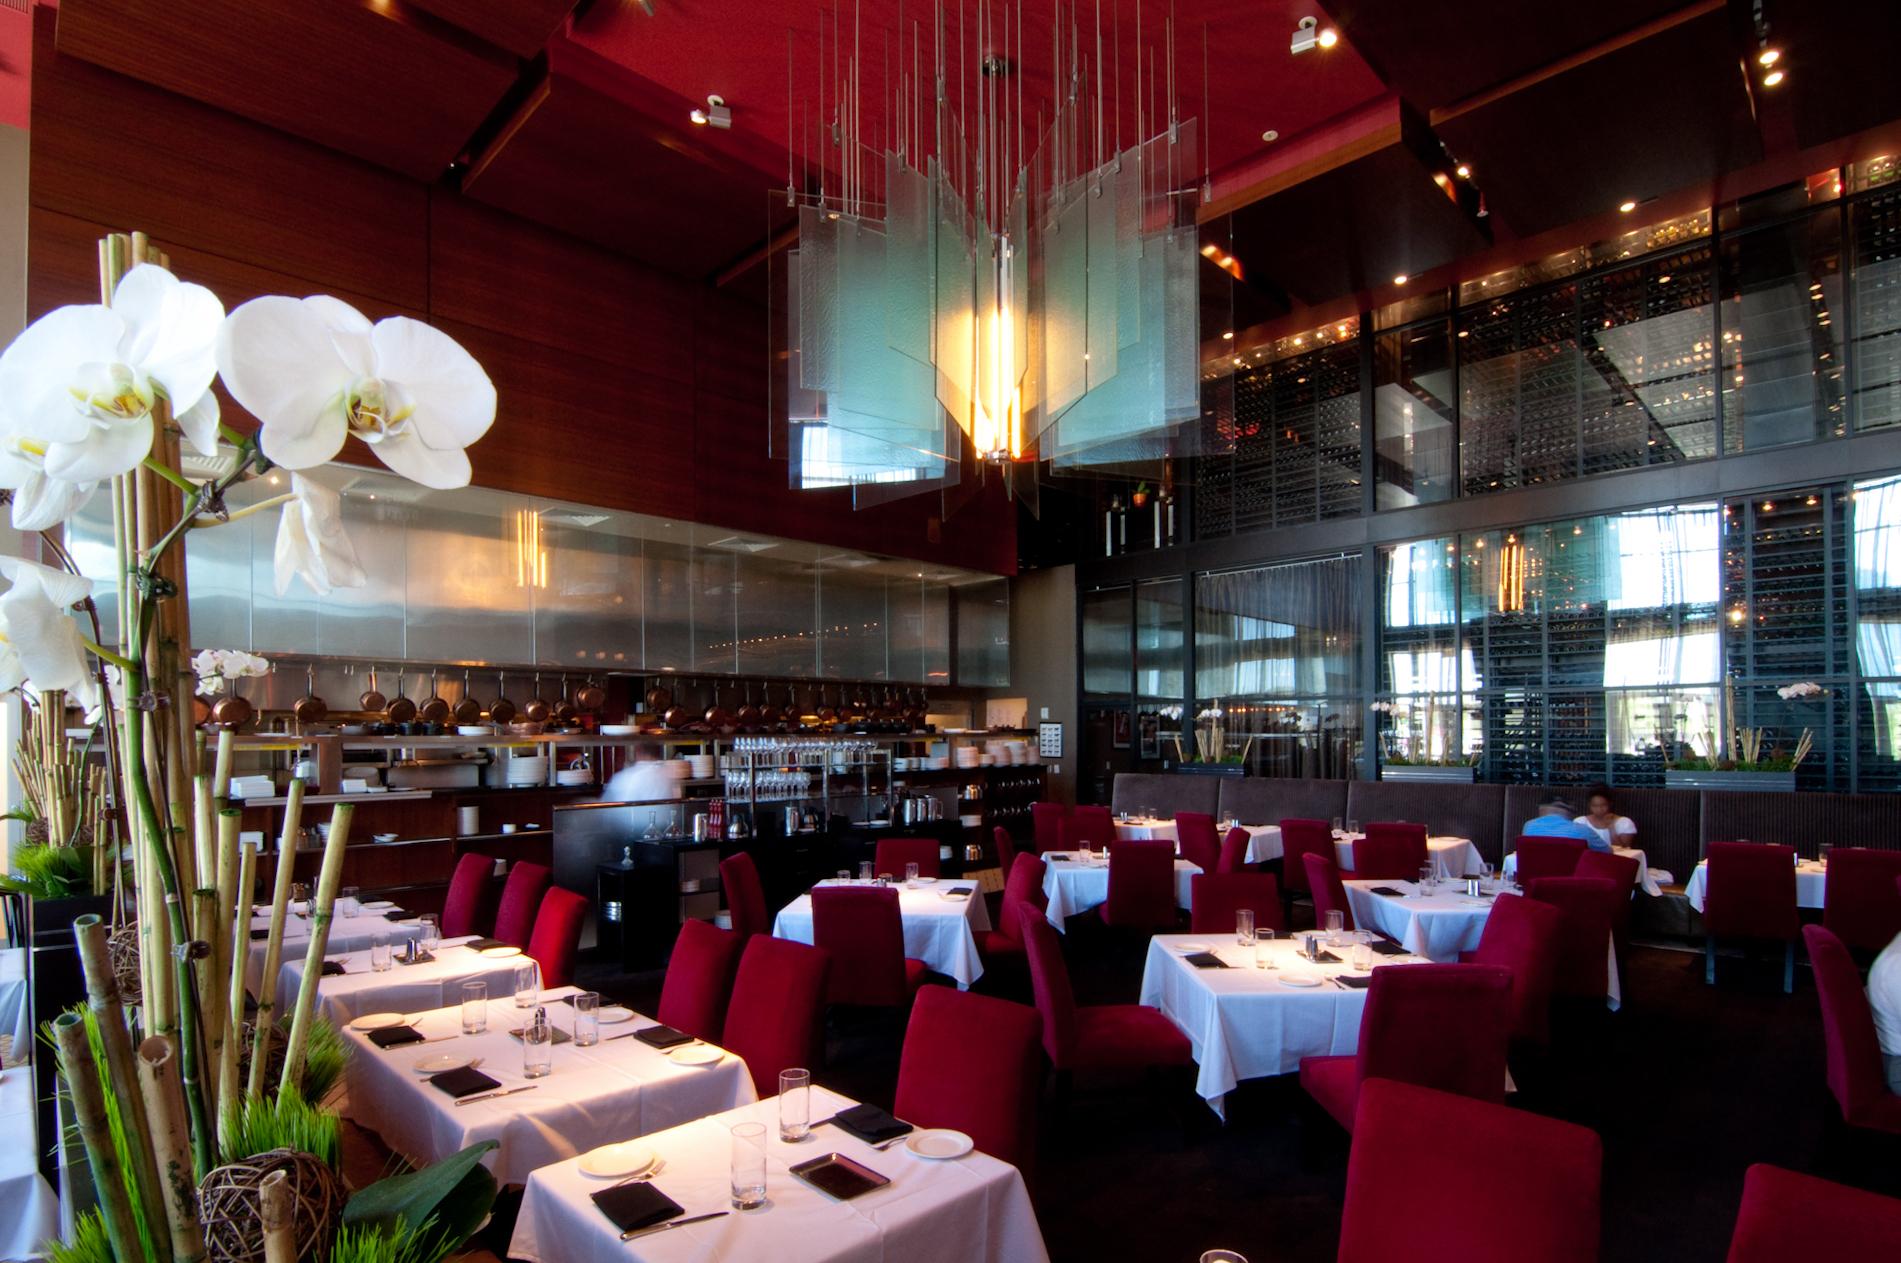 Tramonto's Restaurant